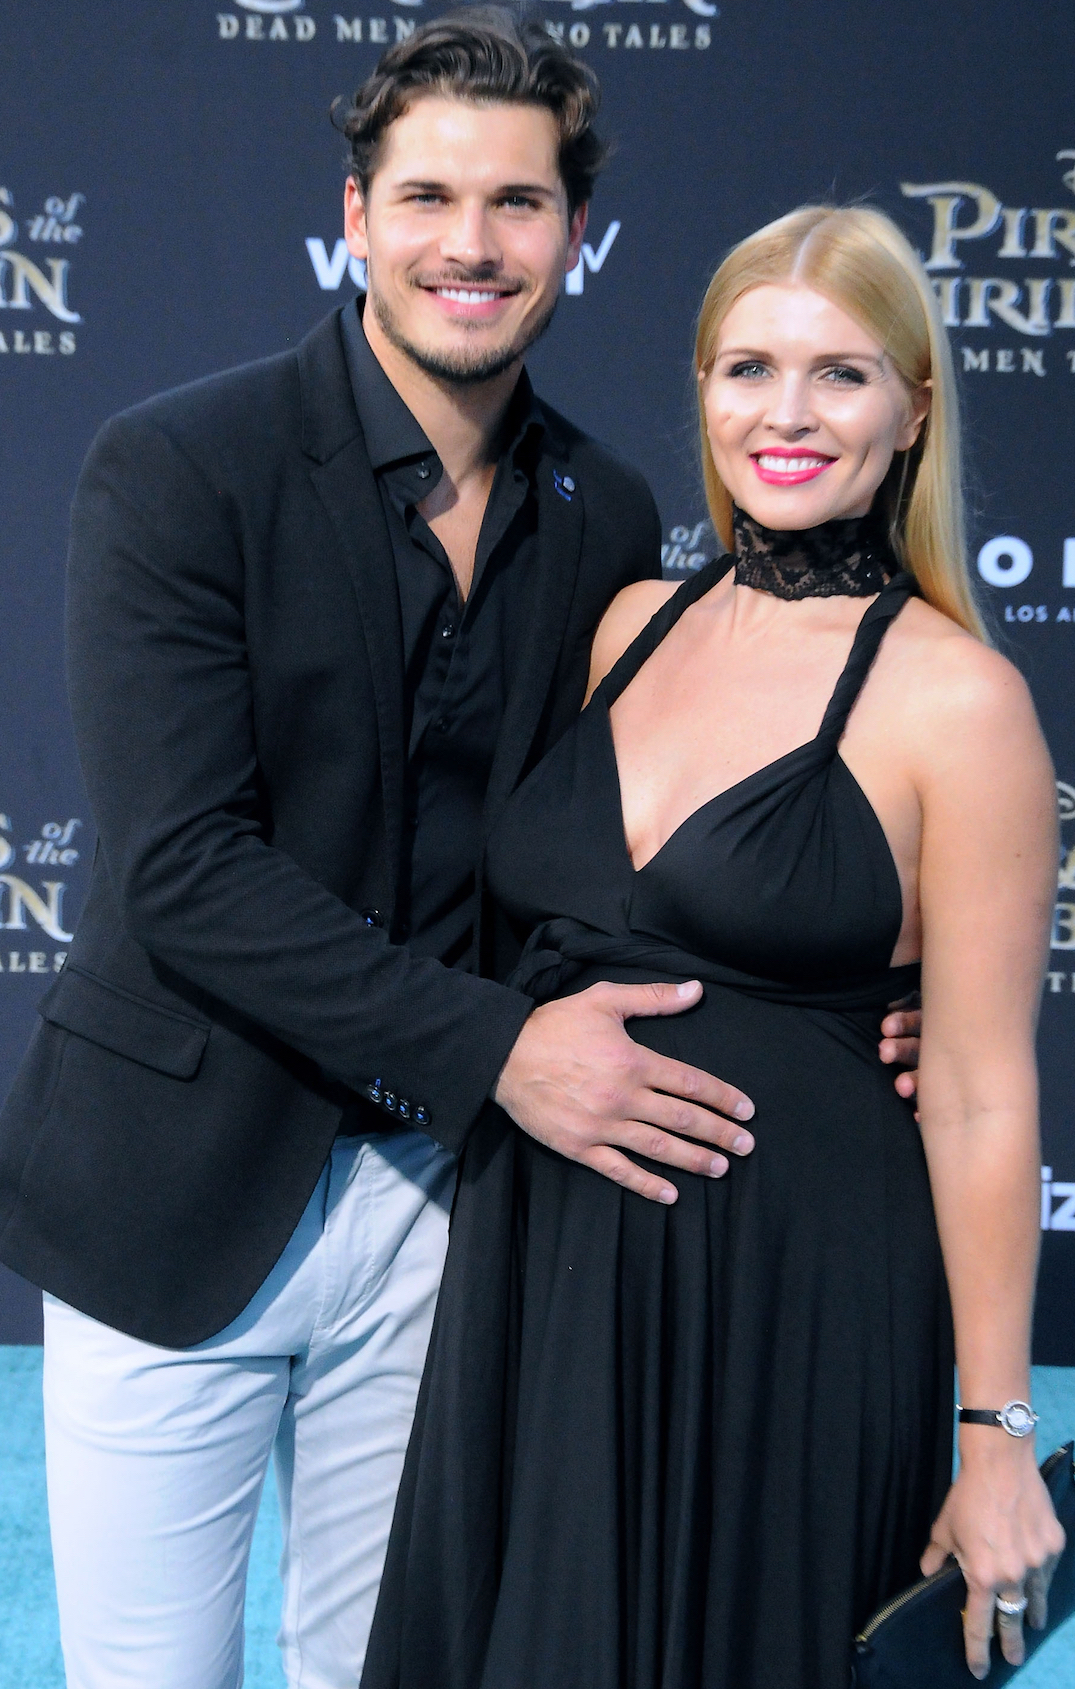 'DWTS' Pro Gleb Savchenko, Wife Elena Samodanova Welcome Baby Girl